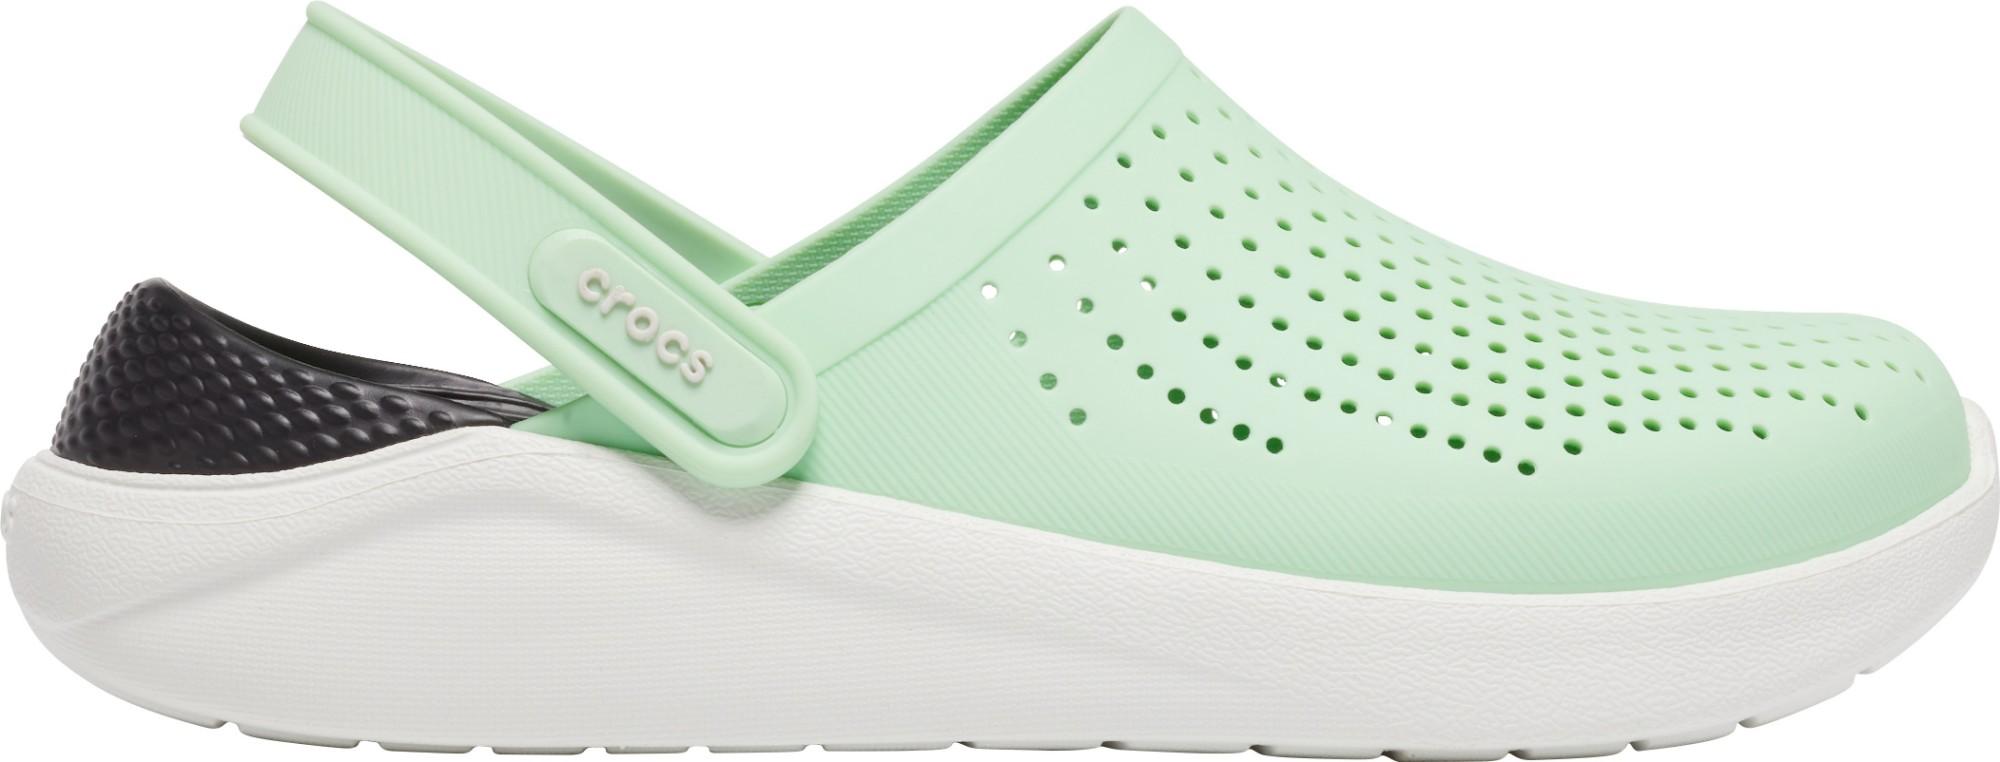 Crocs™ LiteRide Clog Neo Mint/Almost White 39,5